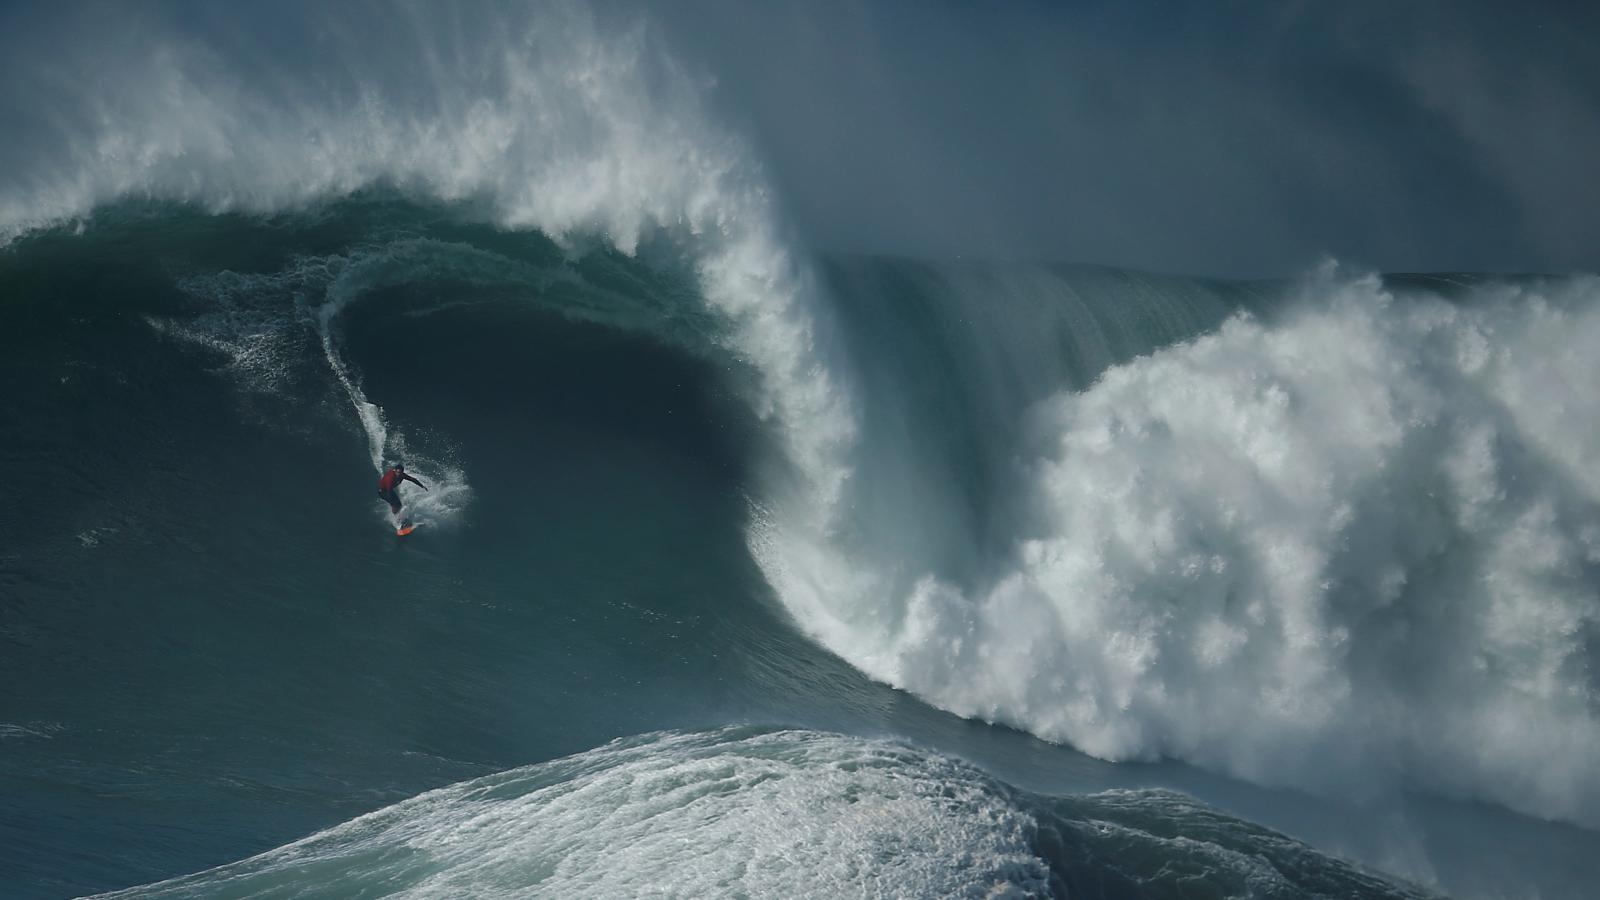 Surfaři v portugalském Nazare